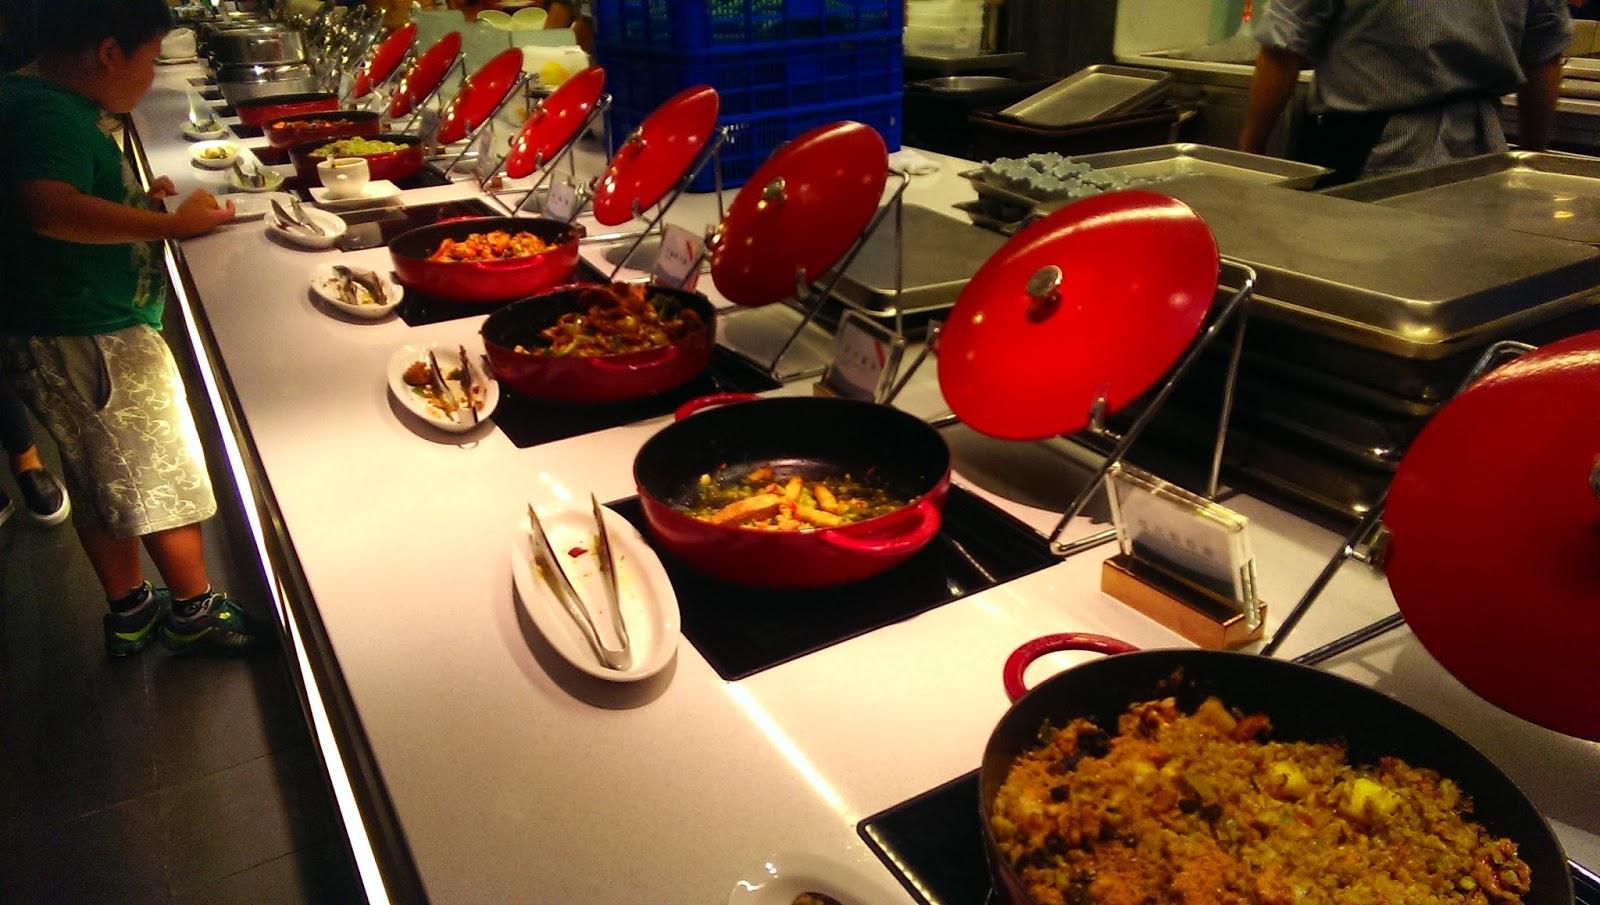 2015 07 01%2B19.19.13 - [食記] 台北京站 - 饗食天堂,有生魚片吃到飽的高級自助餐廳!